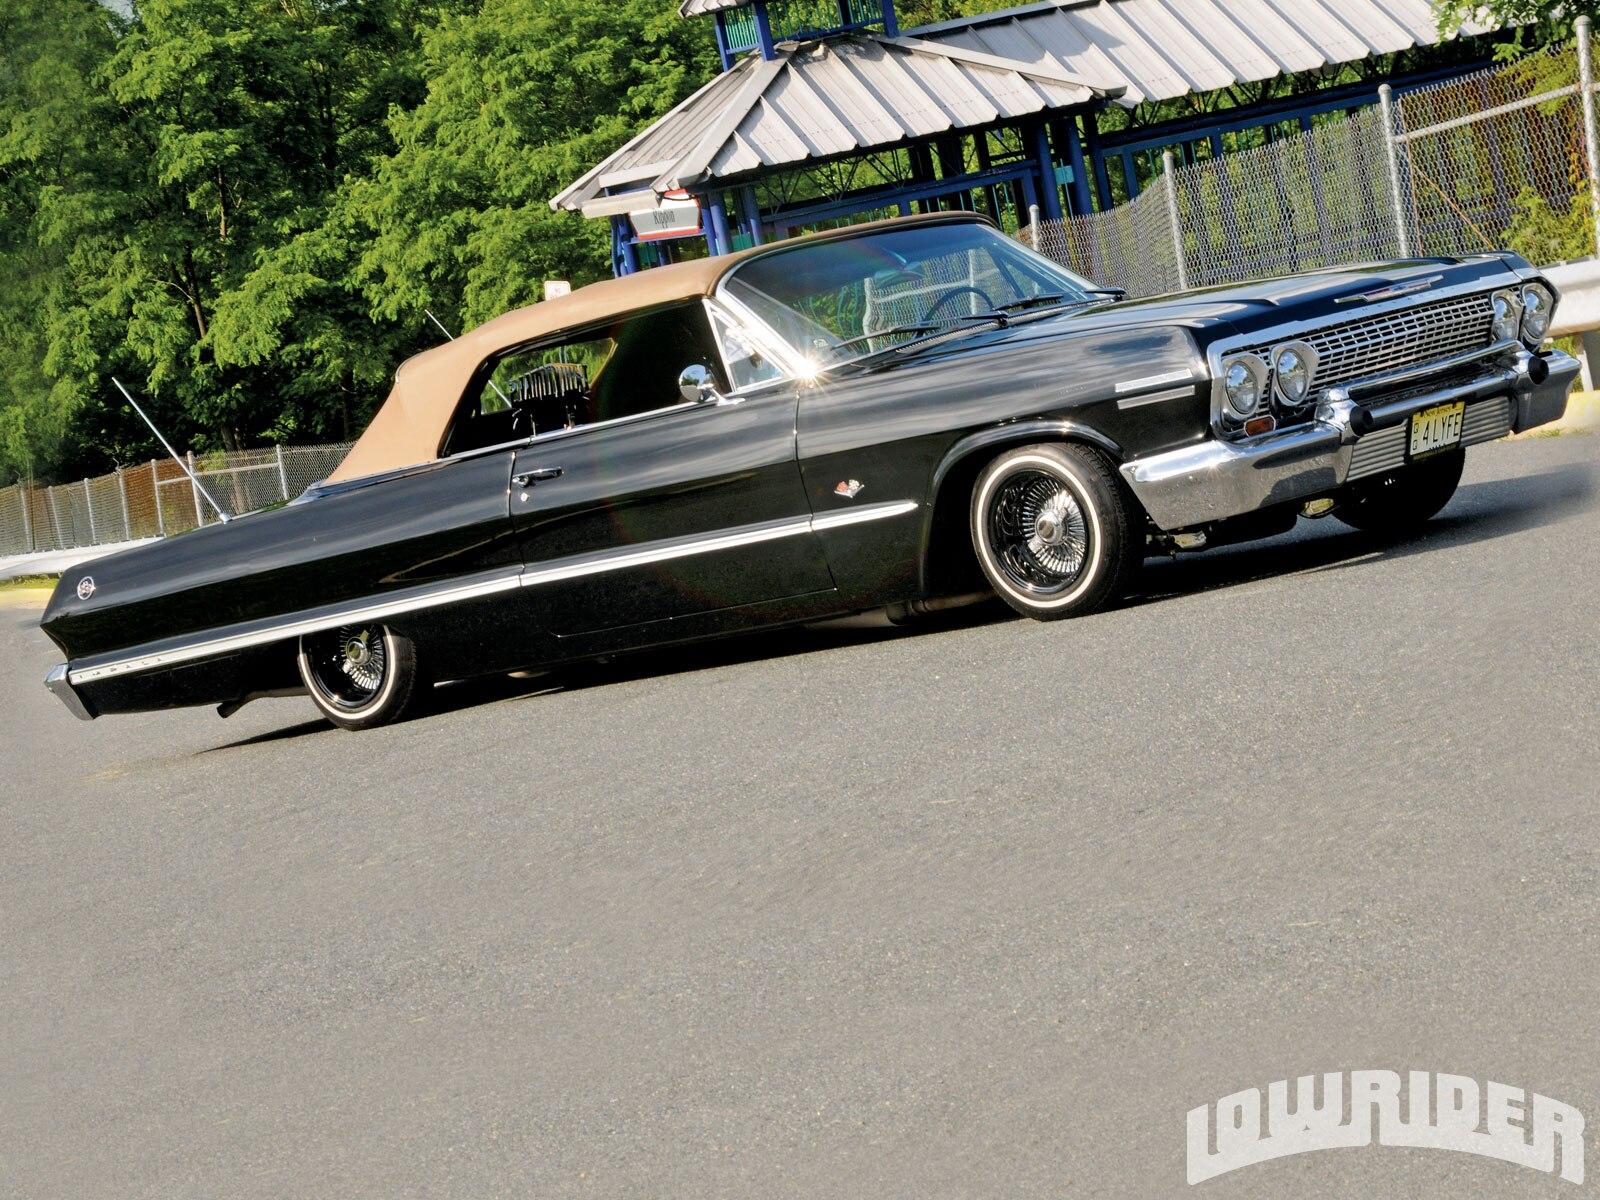 lrmp_1008_02_o-1963_chevrolet_impala_ss_convertible-side_view3